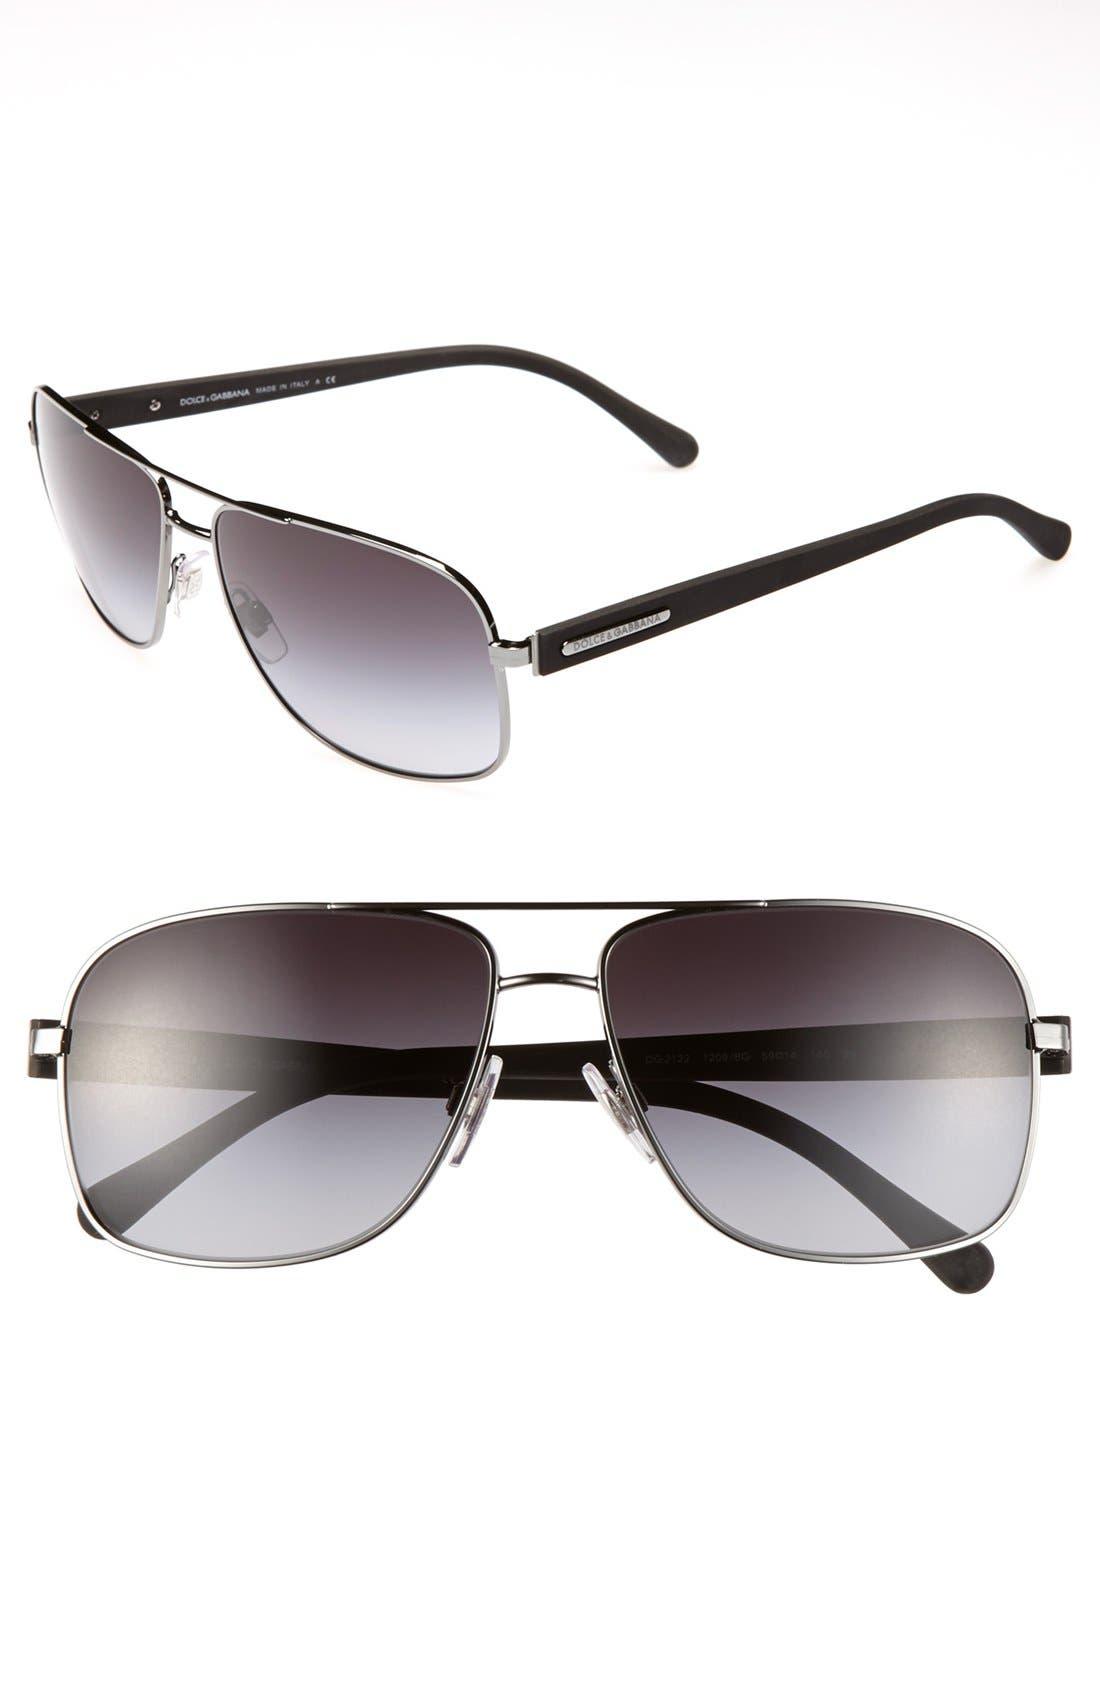 Main Image - Dolce&Gabbana 59mm Square Sunglasses